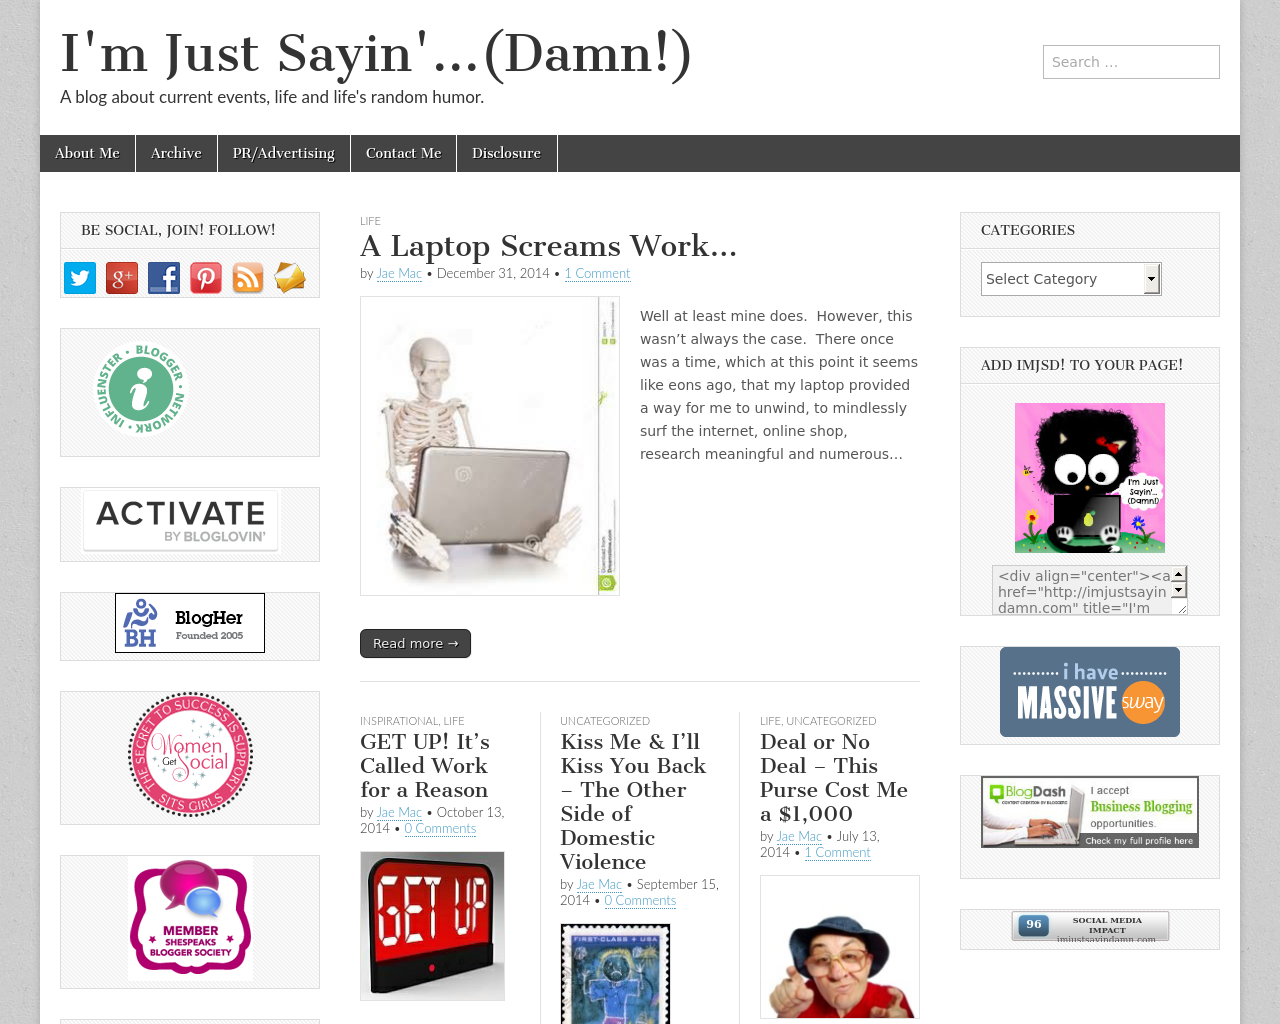 I'm-Just-Sayin'…(Damn!)-Advertising-Reviews-Pricing